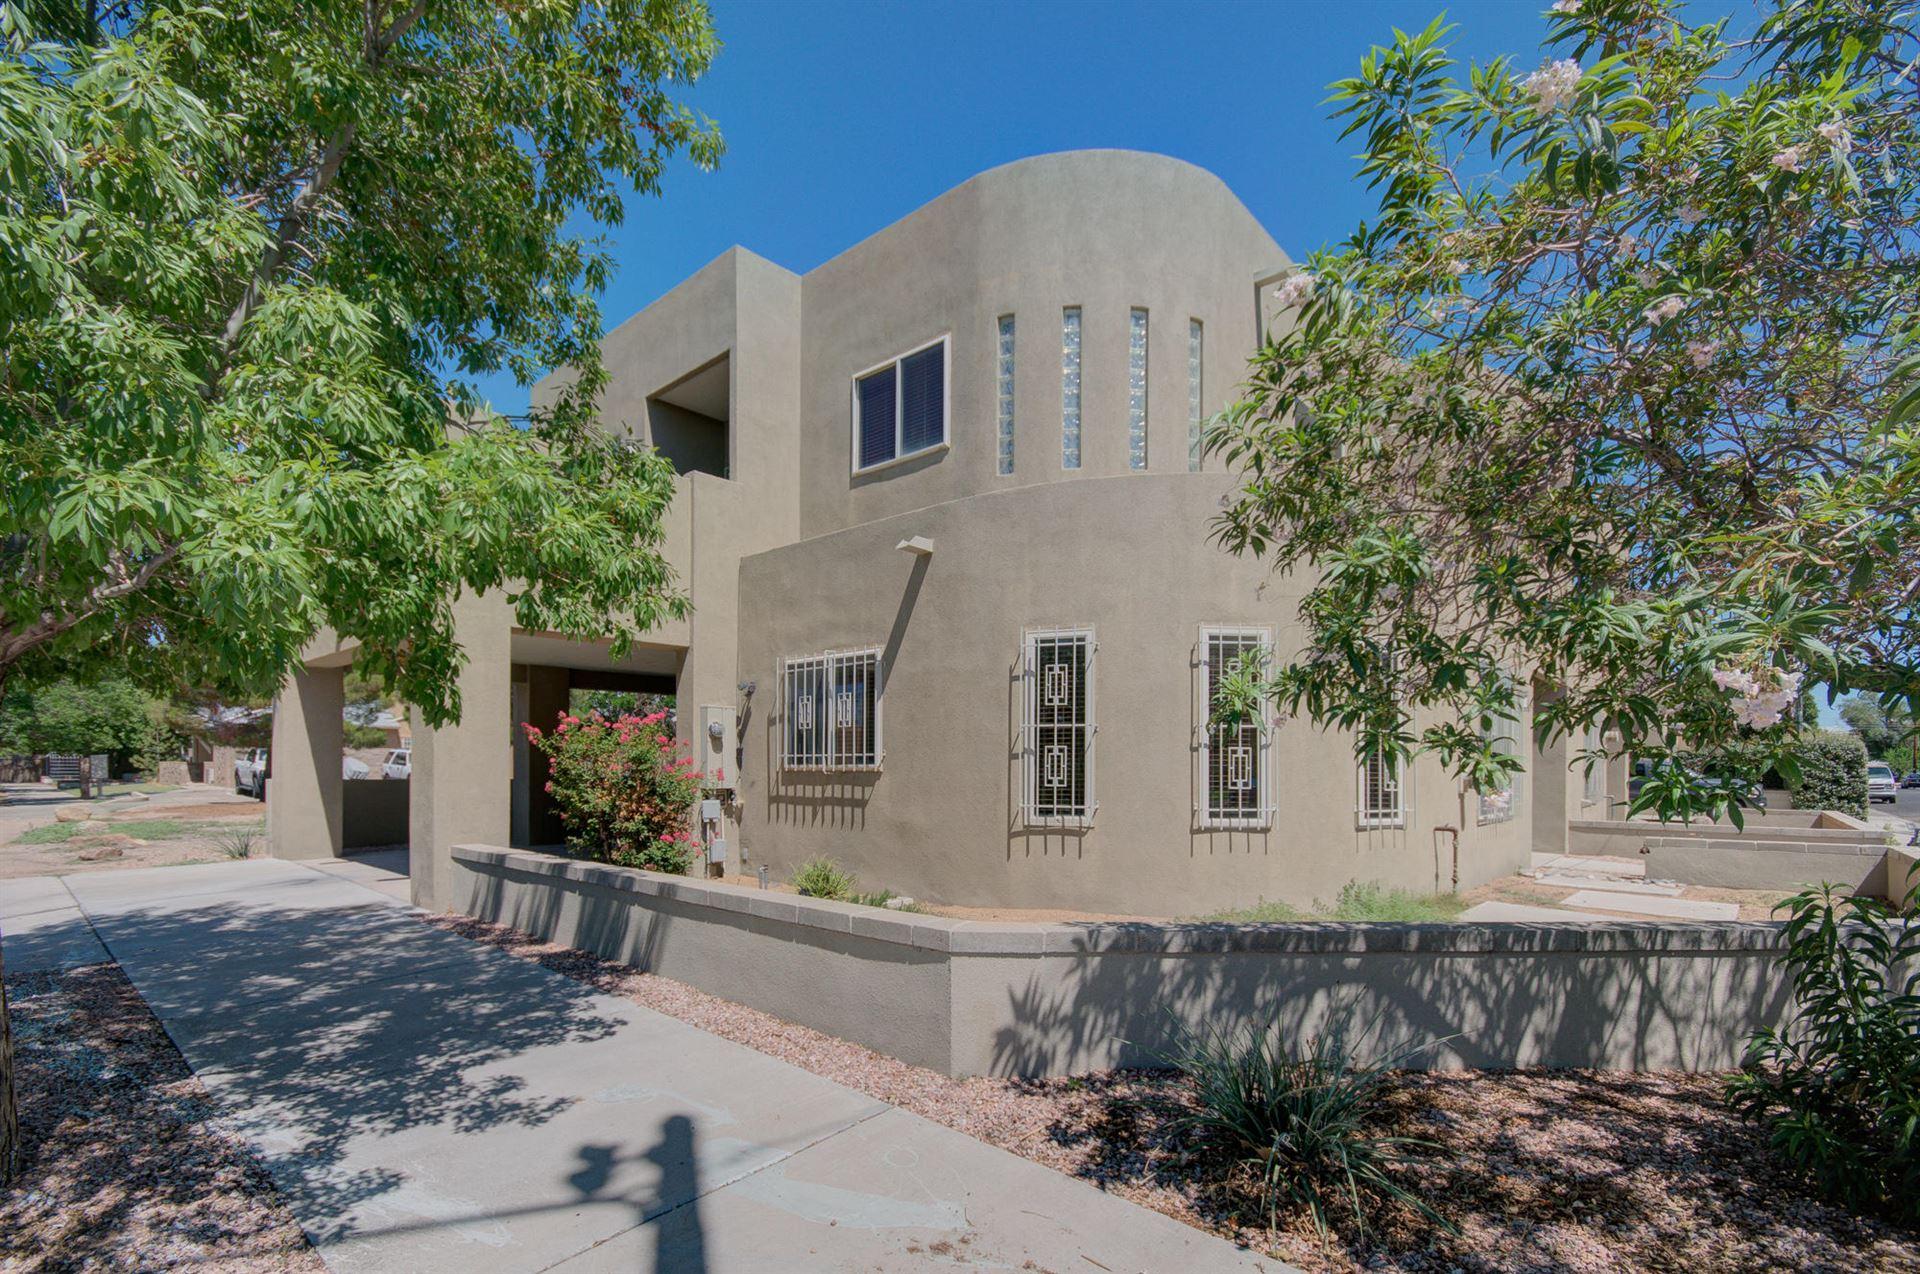 Photo of 315 11TH Street SW, Albuquerque, NM 87102 (MLS # 997774)